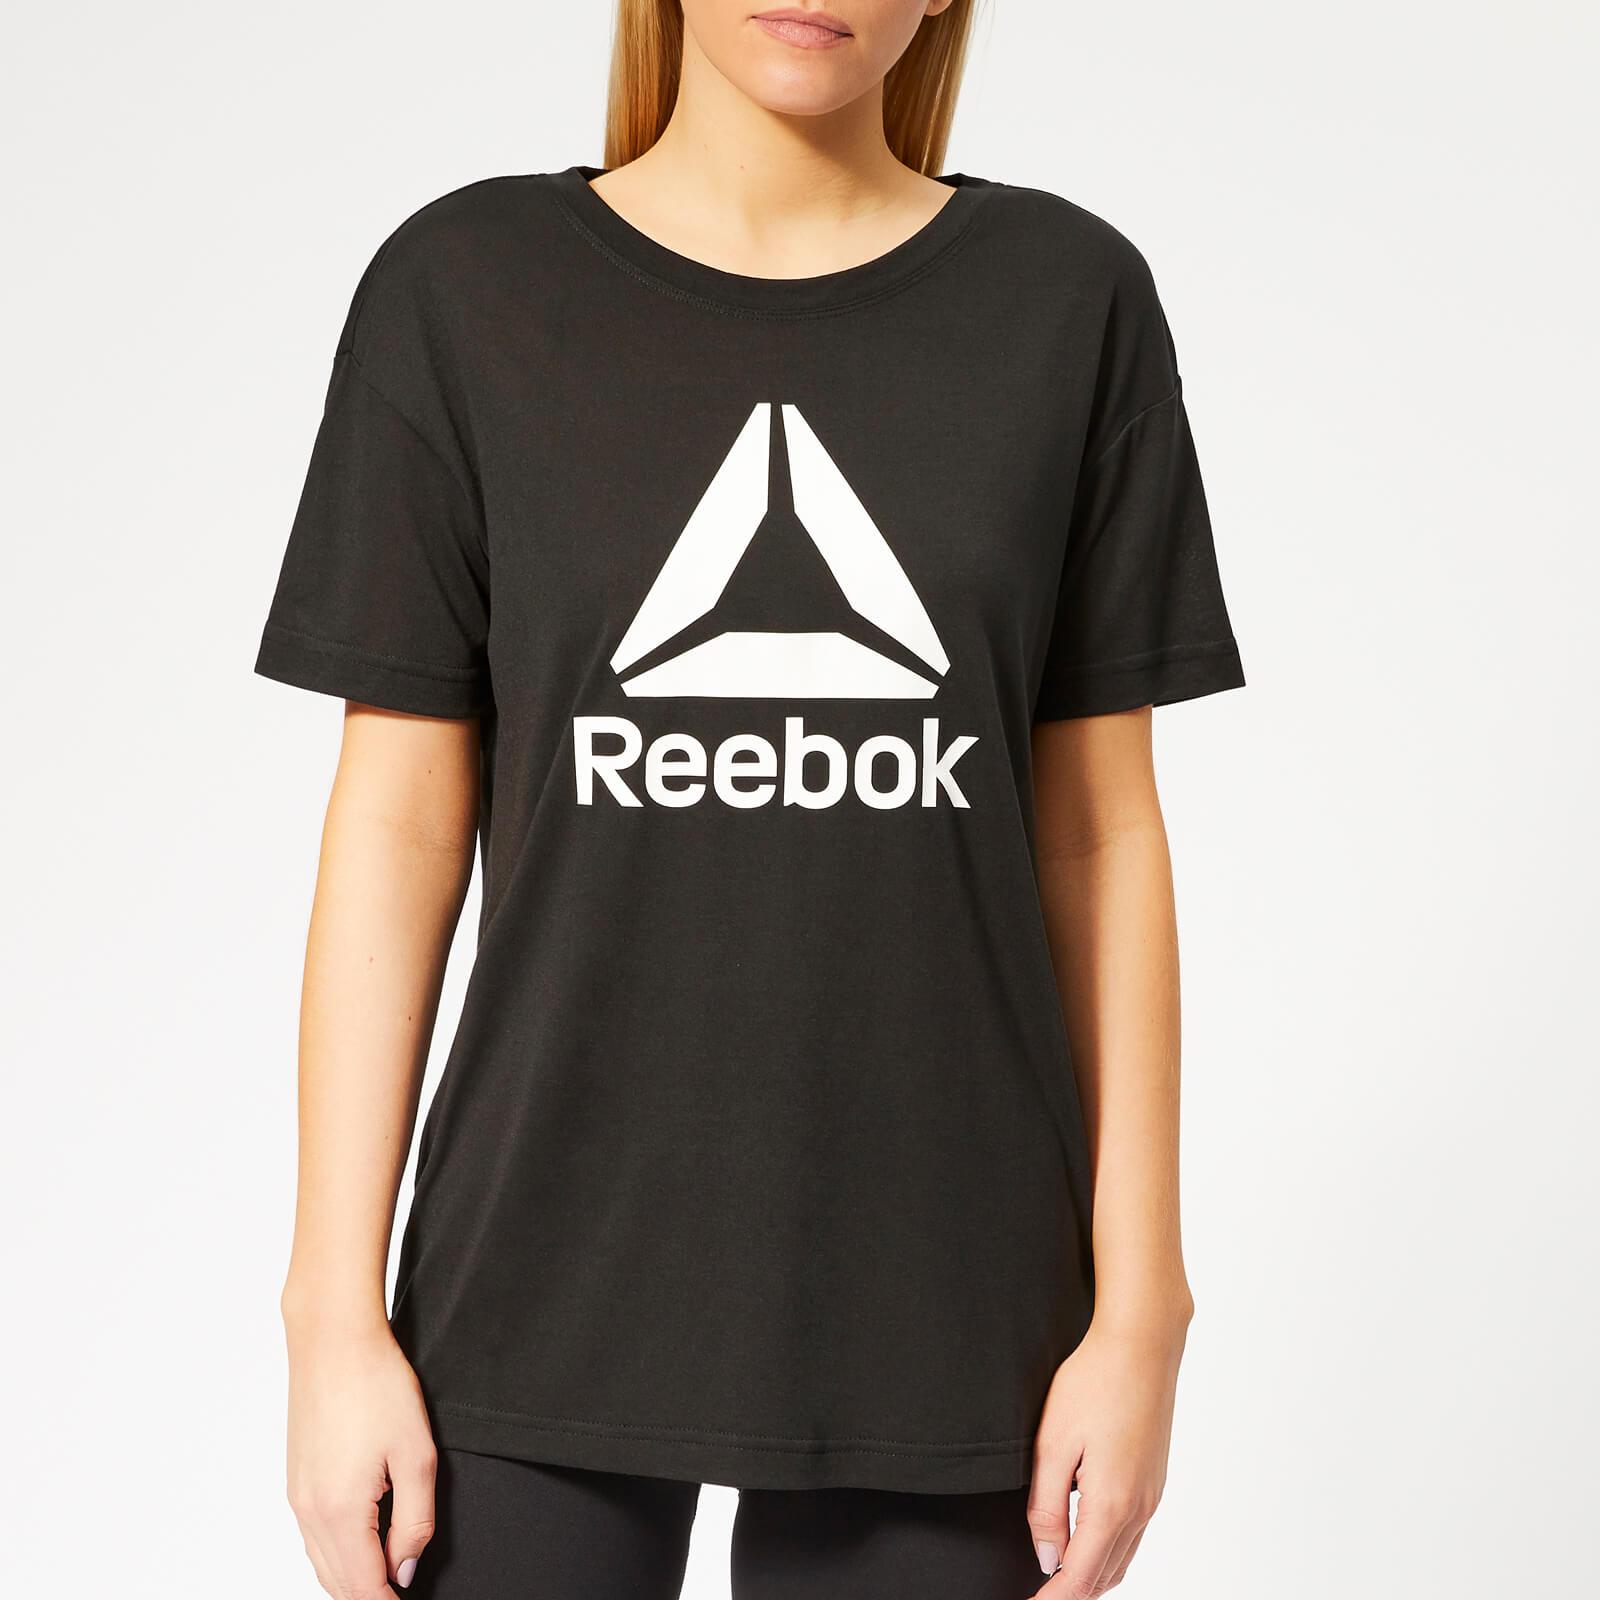 Reebok Women's WOR Supremium 2.0 Short Sleeve T-Shirt - Black - S - Black